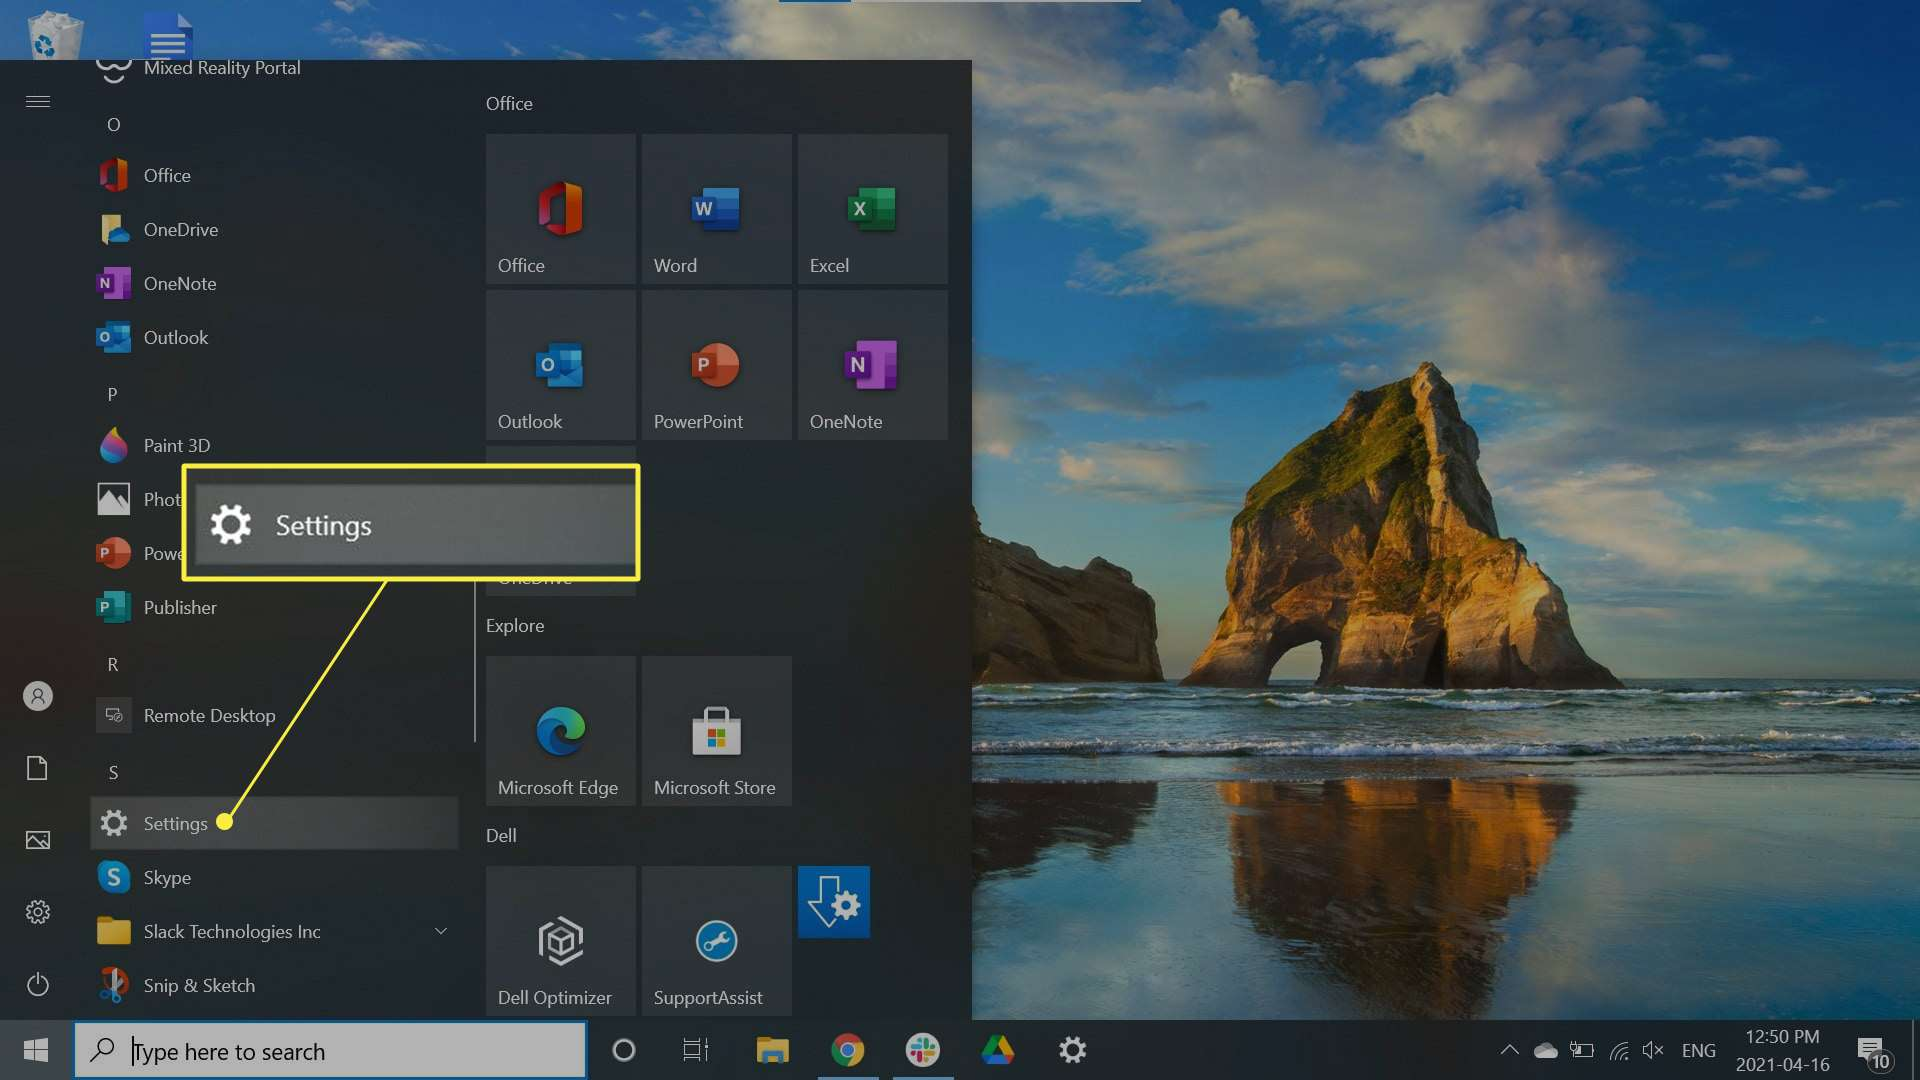 Settings highlighted in the Windows taskbar